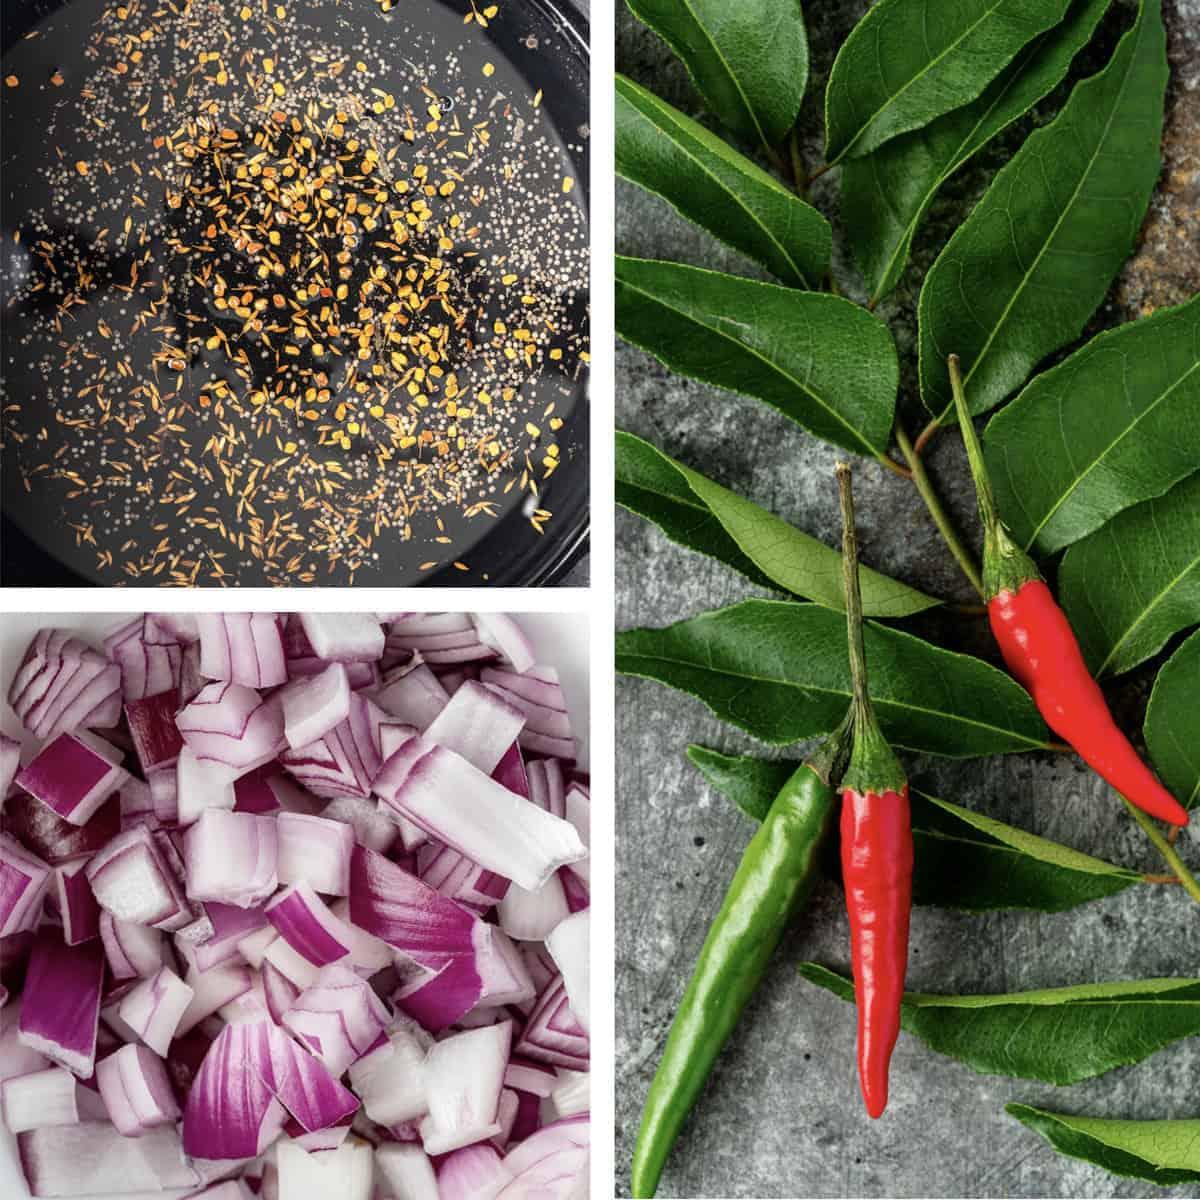 photo collage of ingredients used to make potato masala